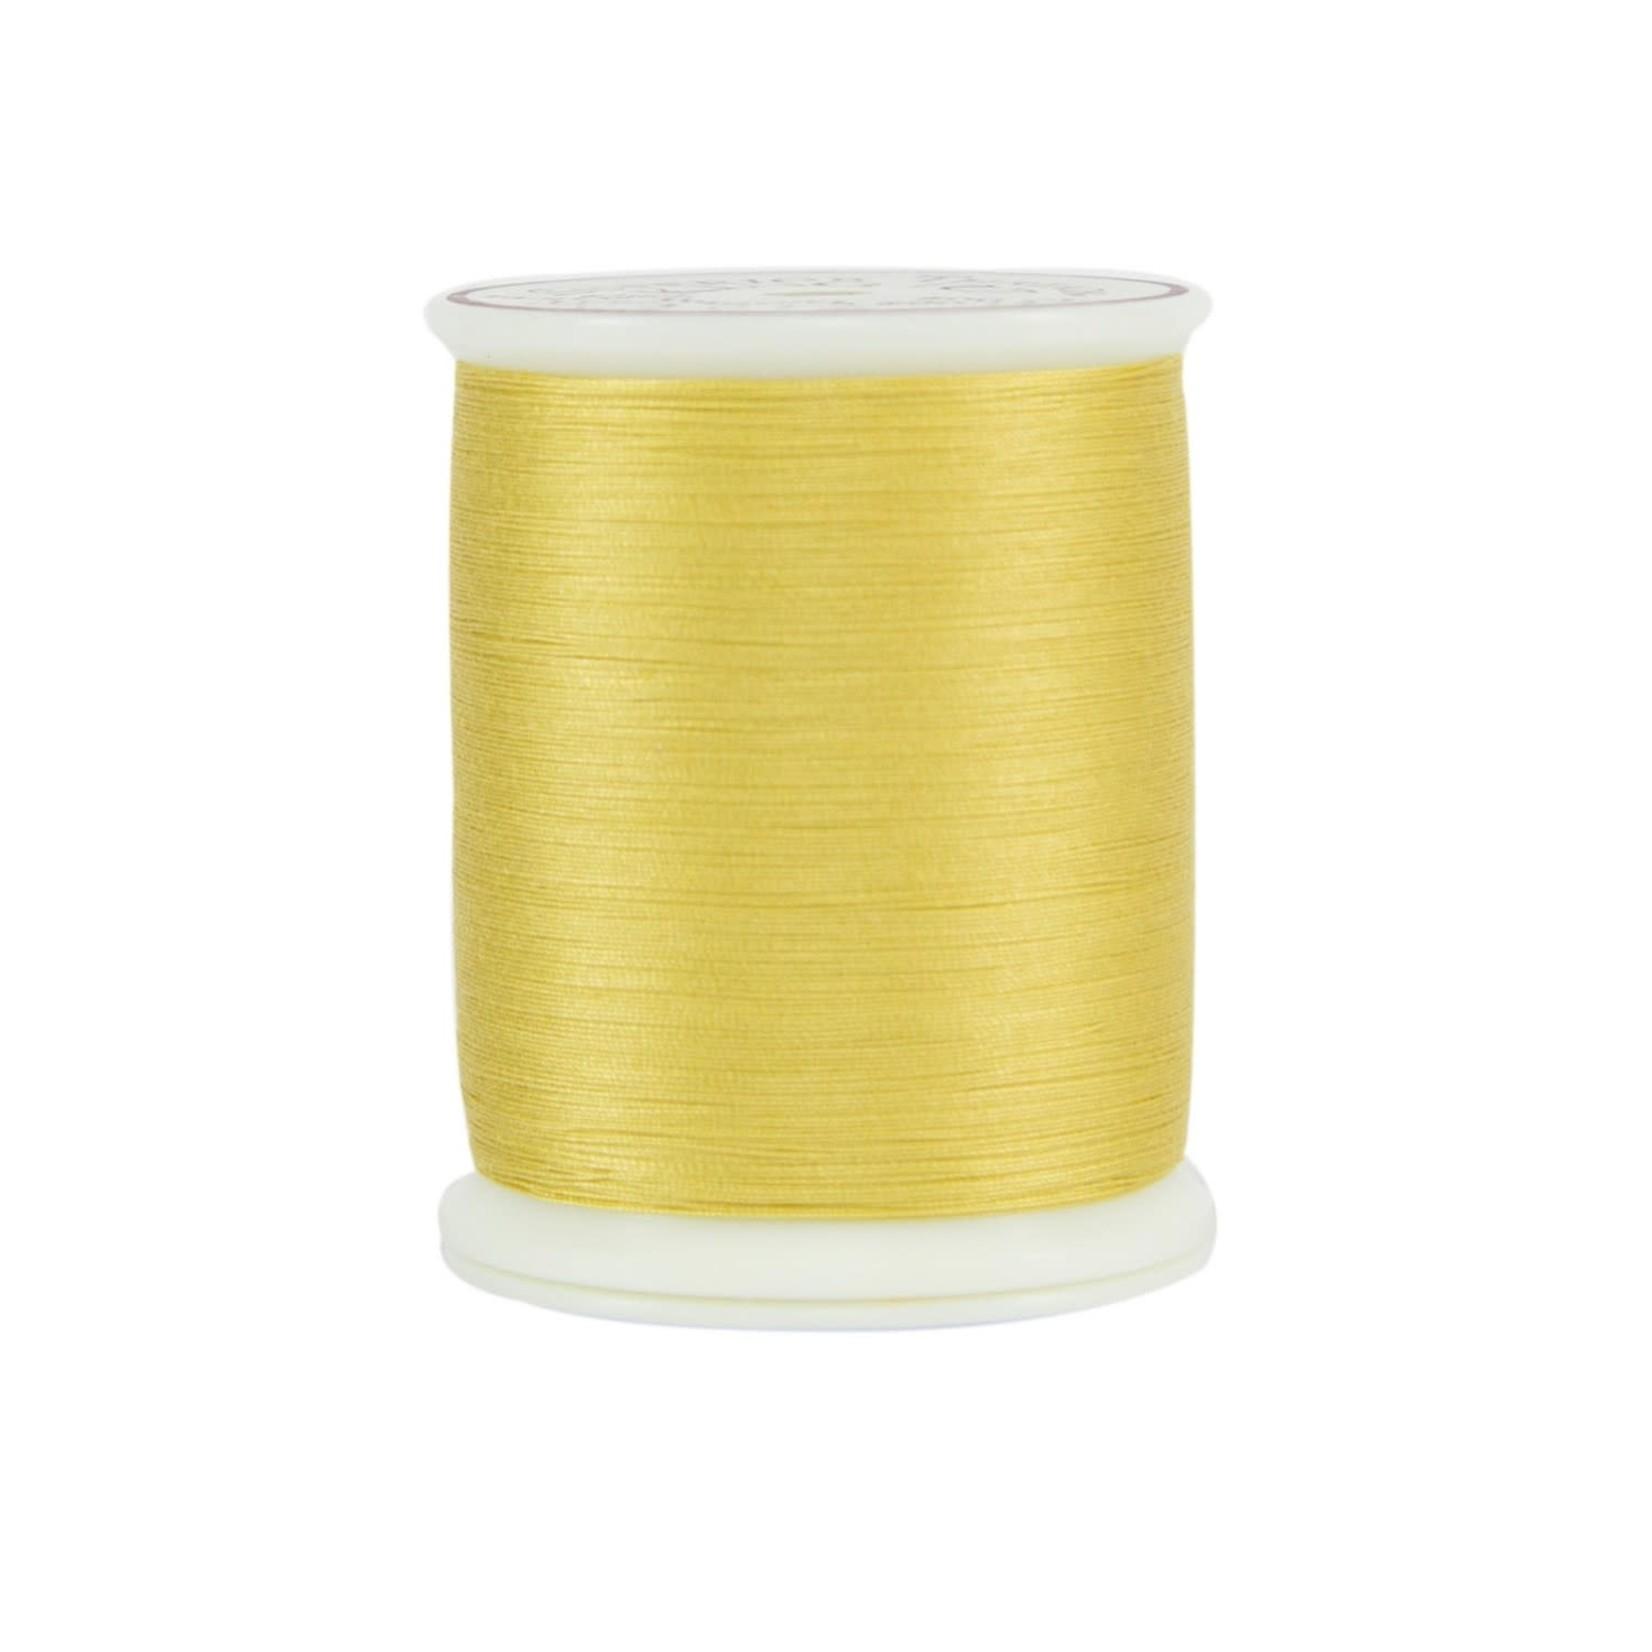 Superior Threads King Tut - #40 - 457 m - 1012 Barley Sugar